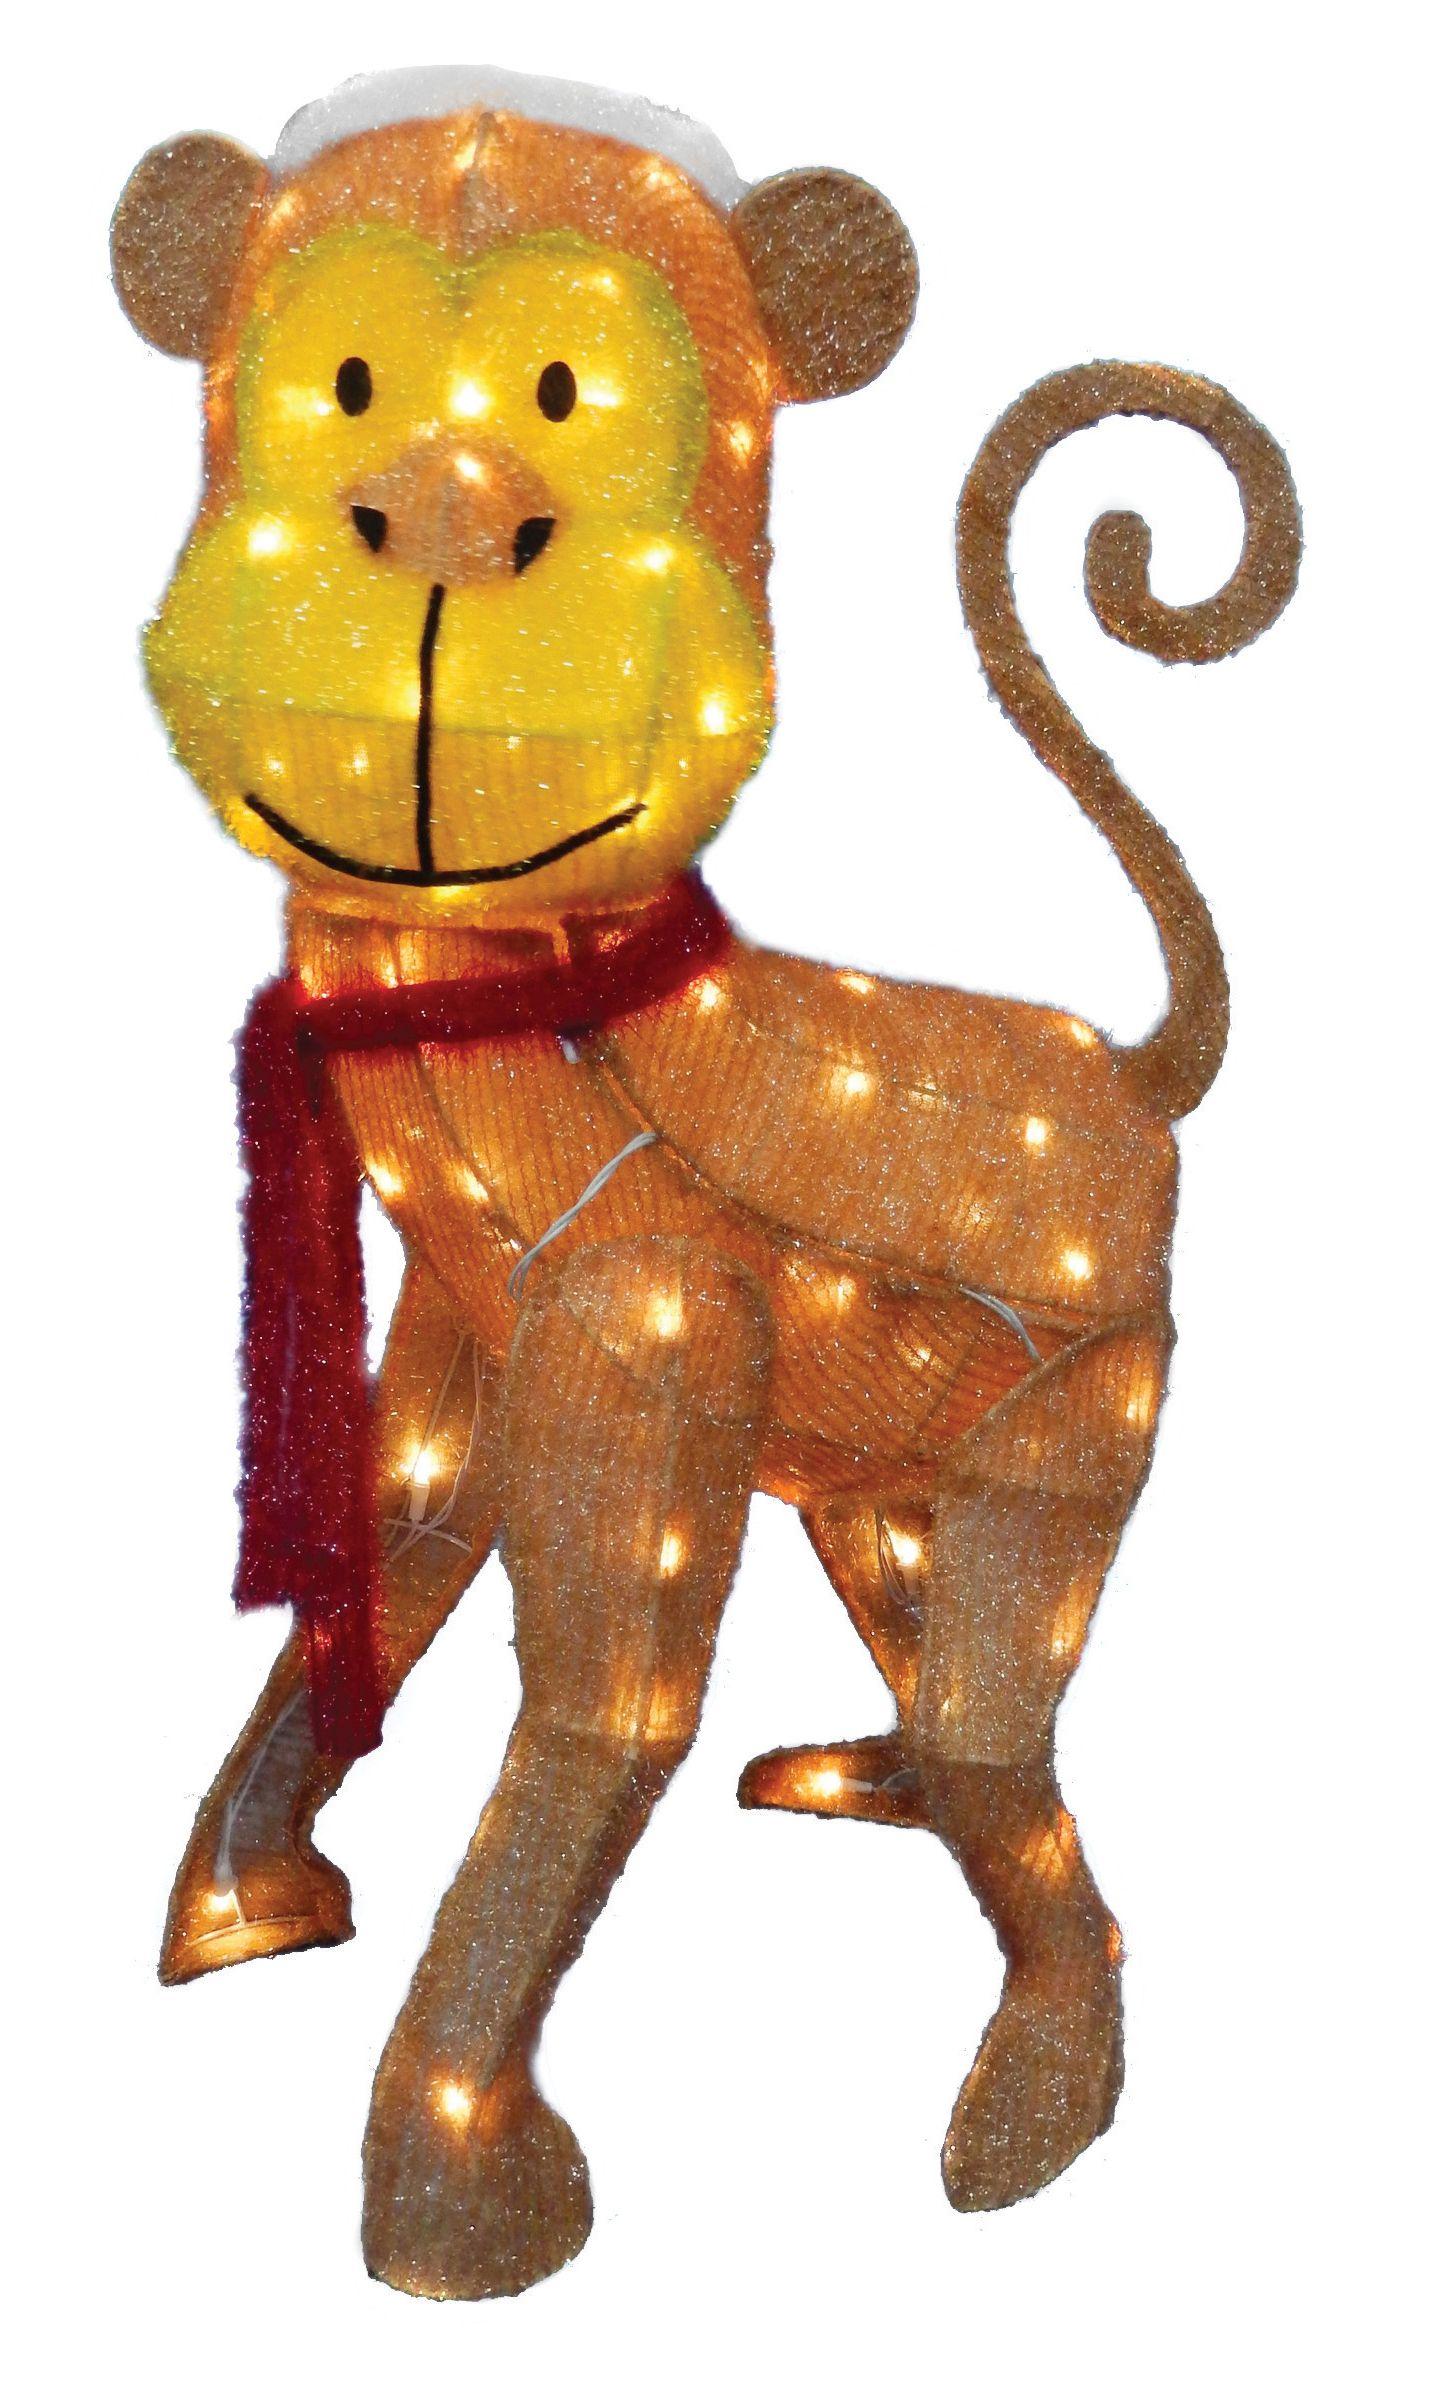 There S Always Time To Monkey Around This Christmas Season Http Www Menards Com Main P 2389571 Christmas Yard Decorations Christmas Yard Animated Christmas